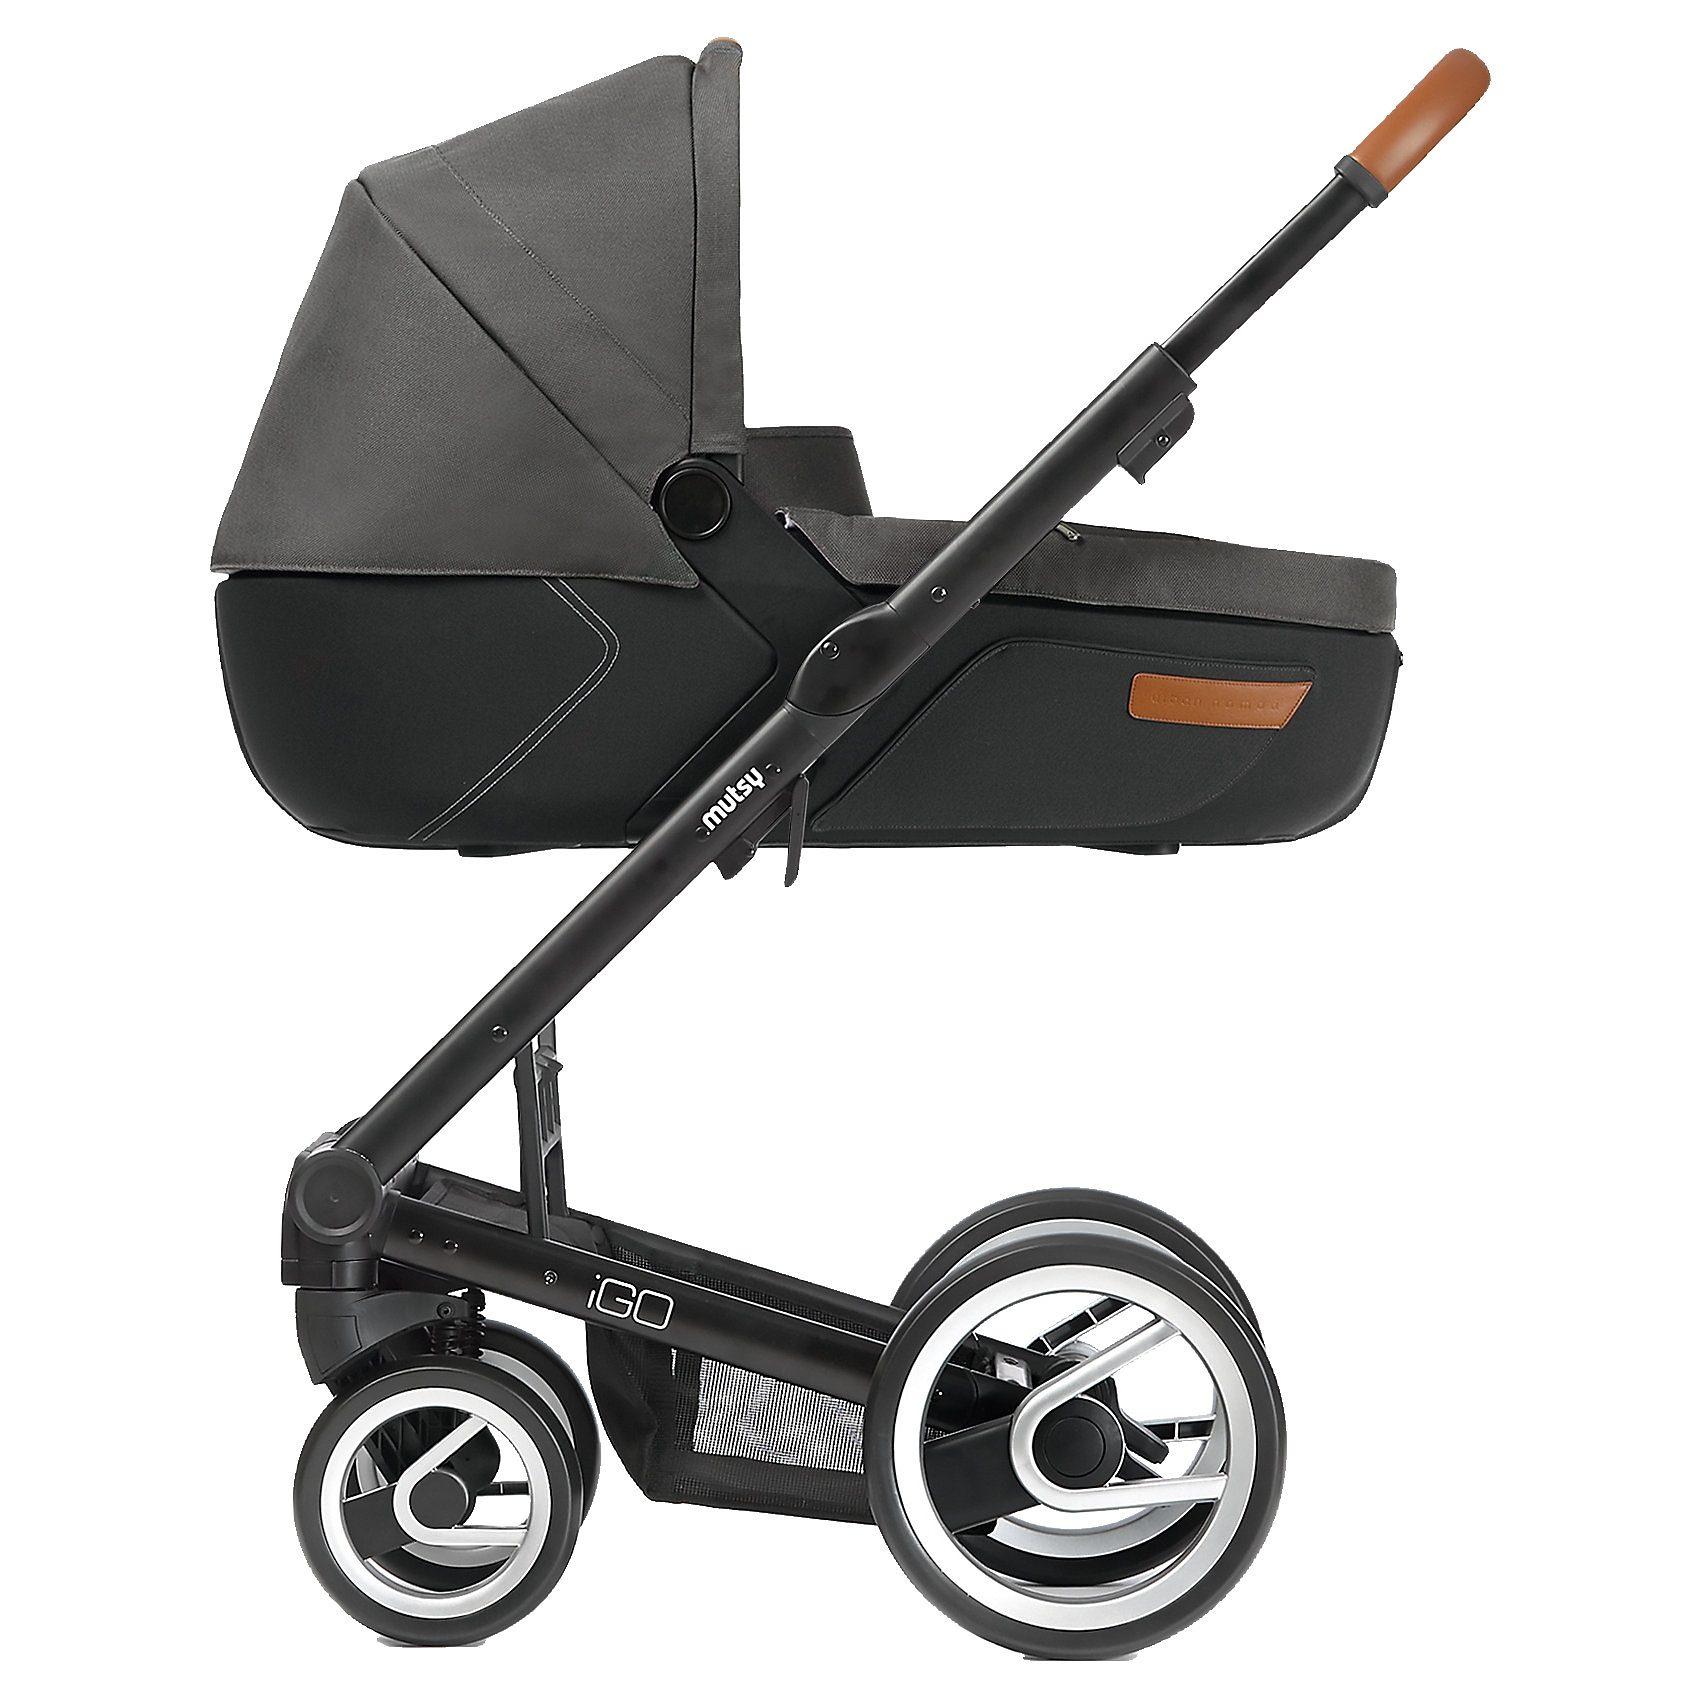 mutsy Kombi-Kinderwagen Igo, urban nomad dark grey, Gestell black,